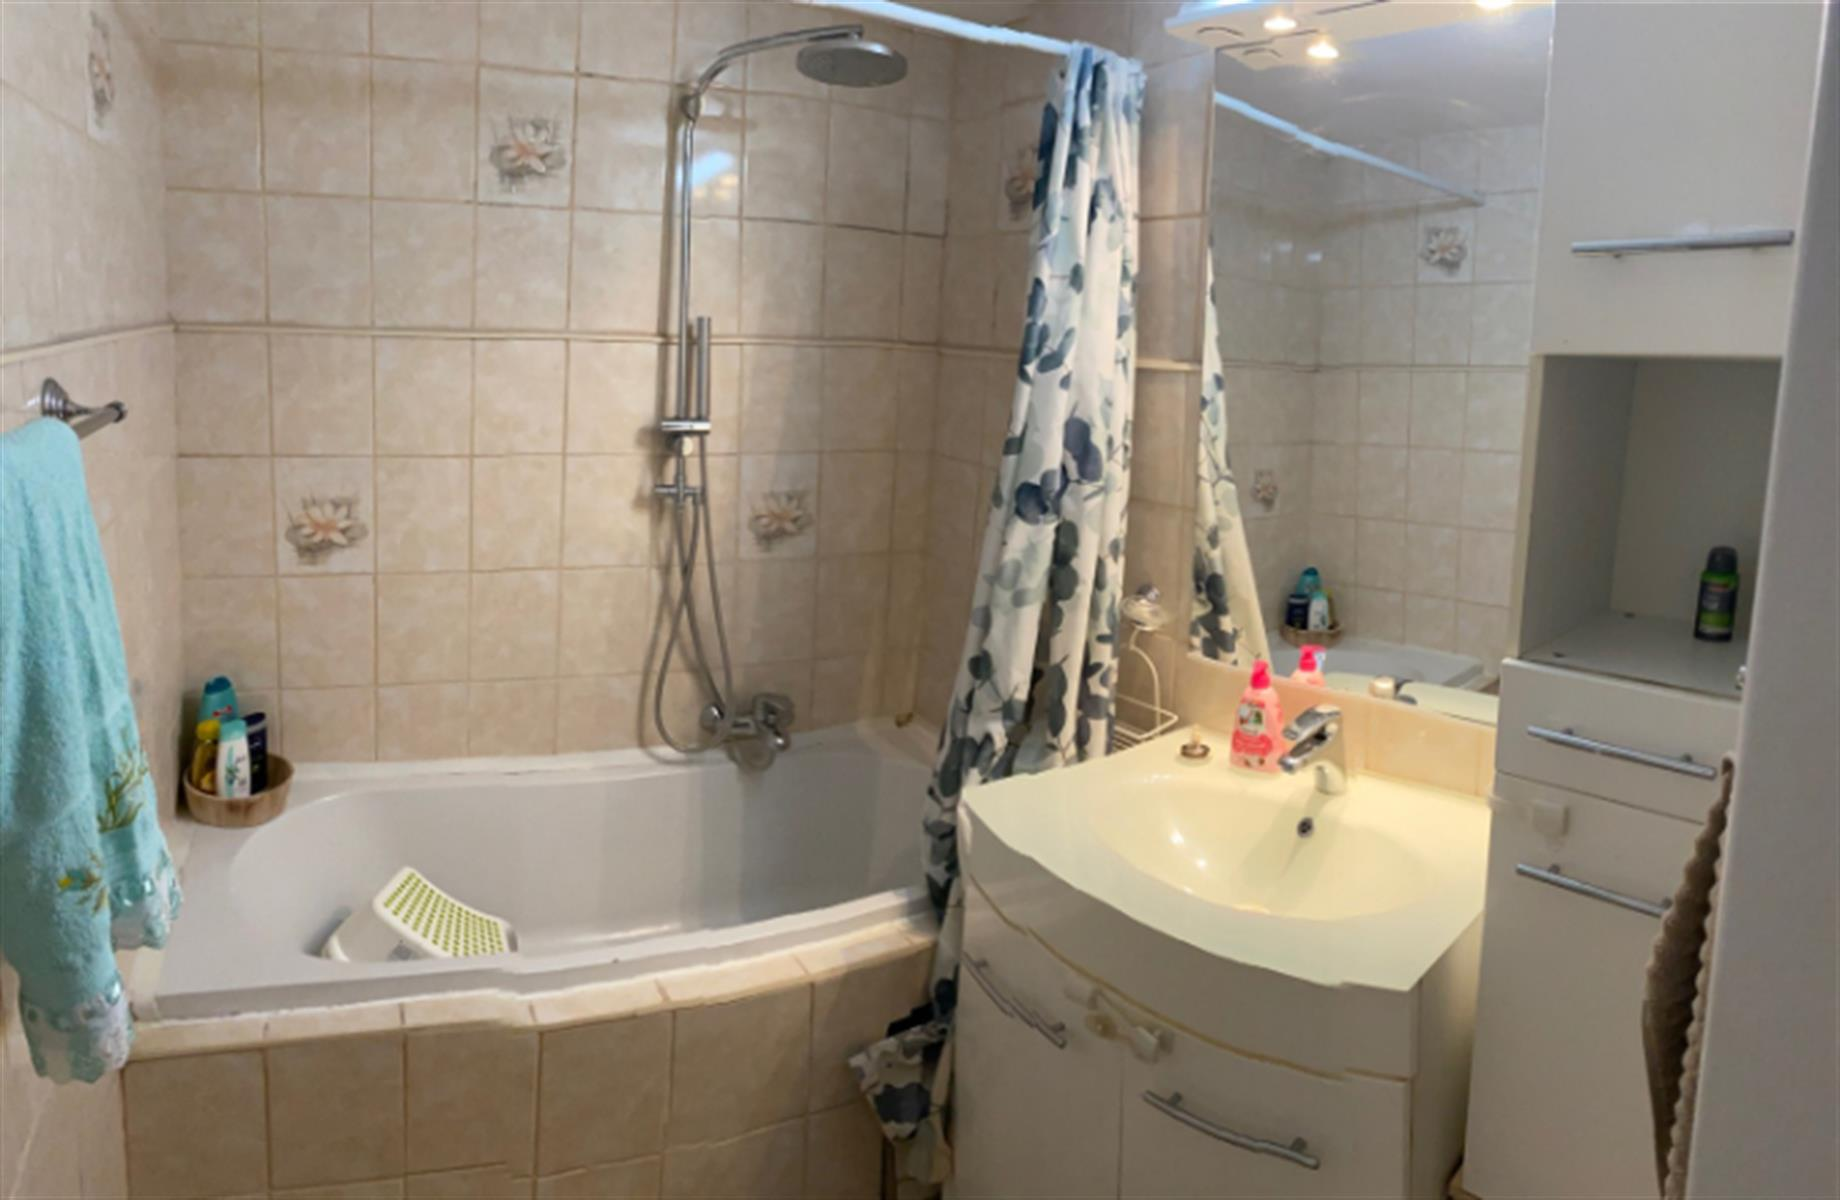 Appartement - Woluwe-Saint-Lambert - #4025134-8